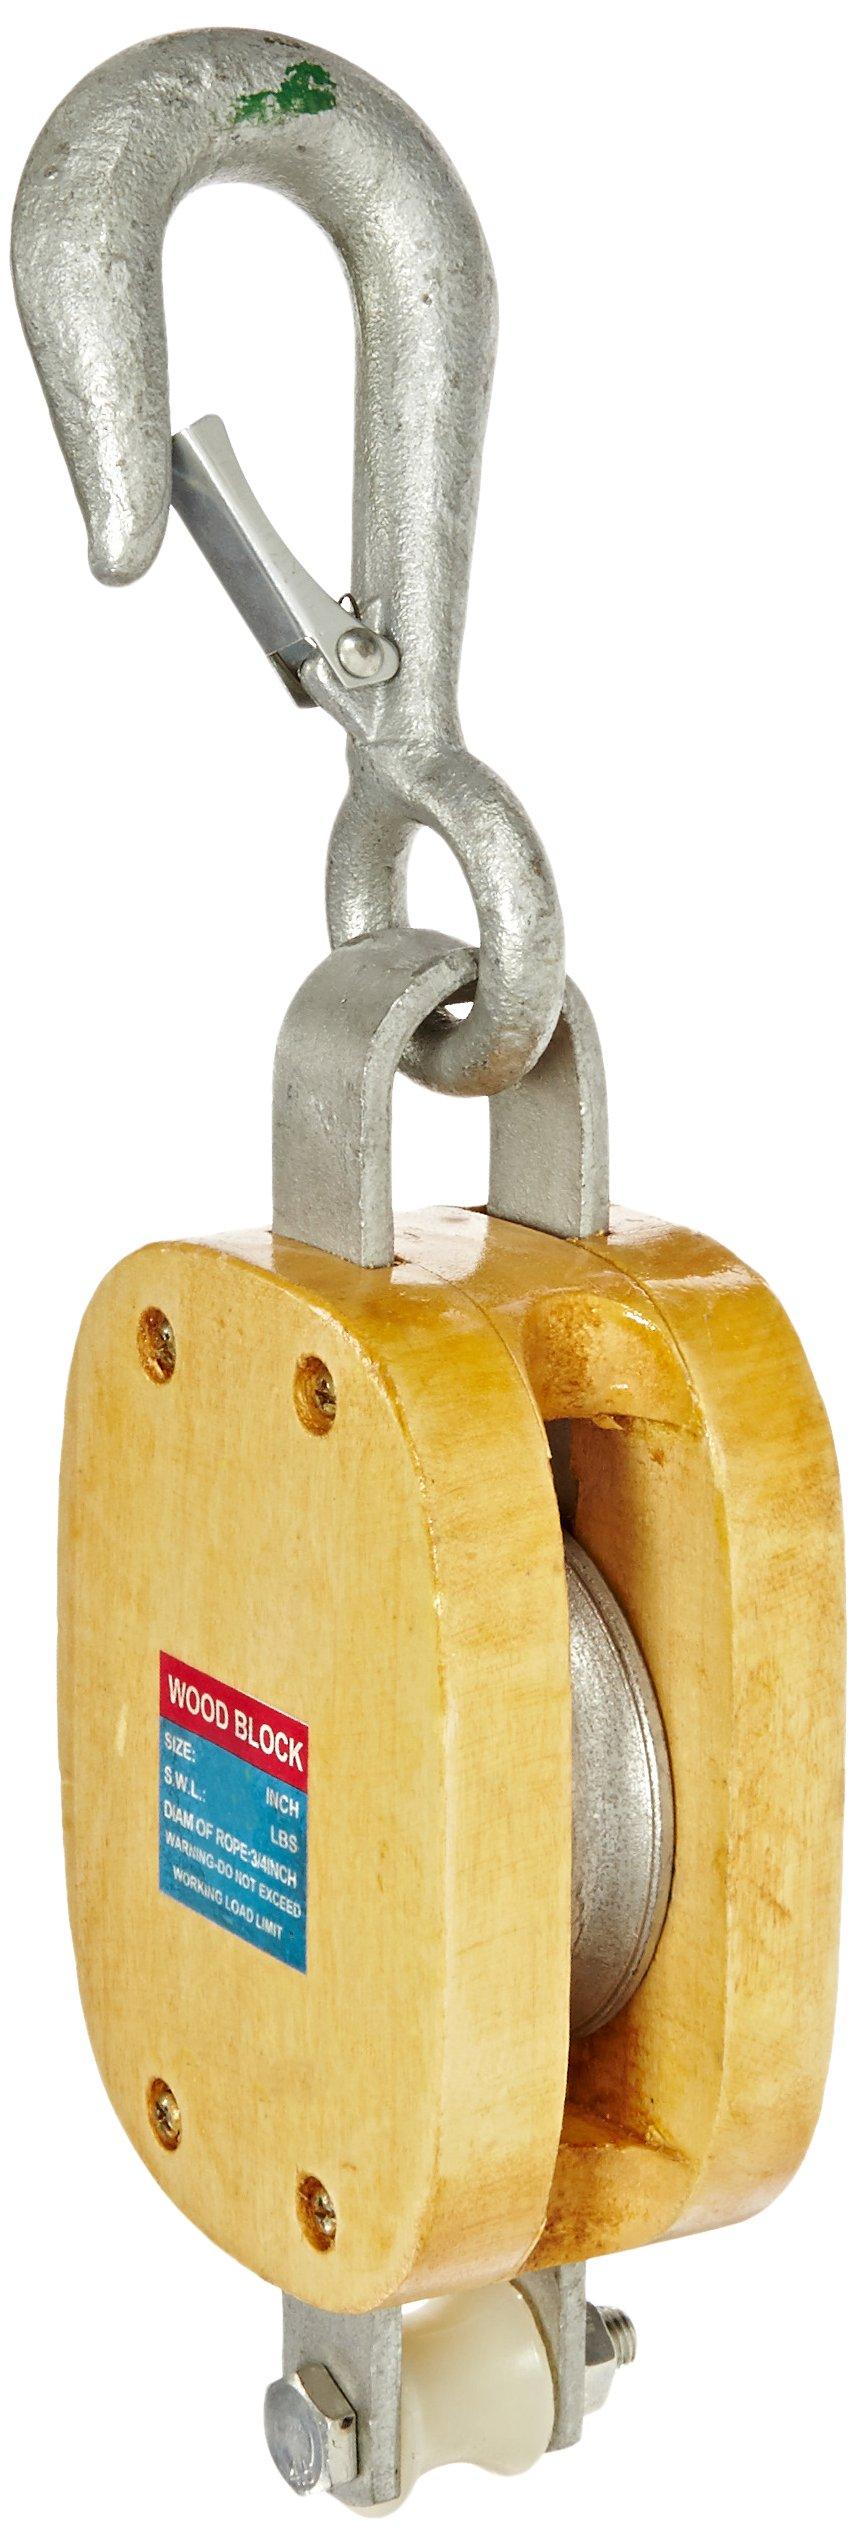 Indusco 16900086 6'' Single Wood Manila Rope Block with Hook, 1800 lbs Load Capacity, 3/4'' Rope, 3-1/2'' Sheave